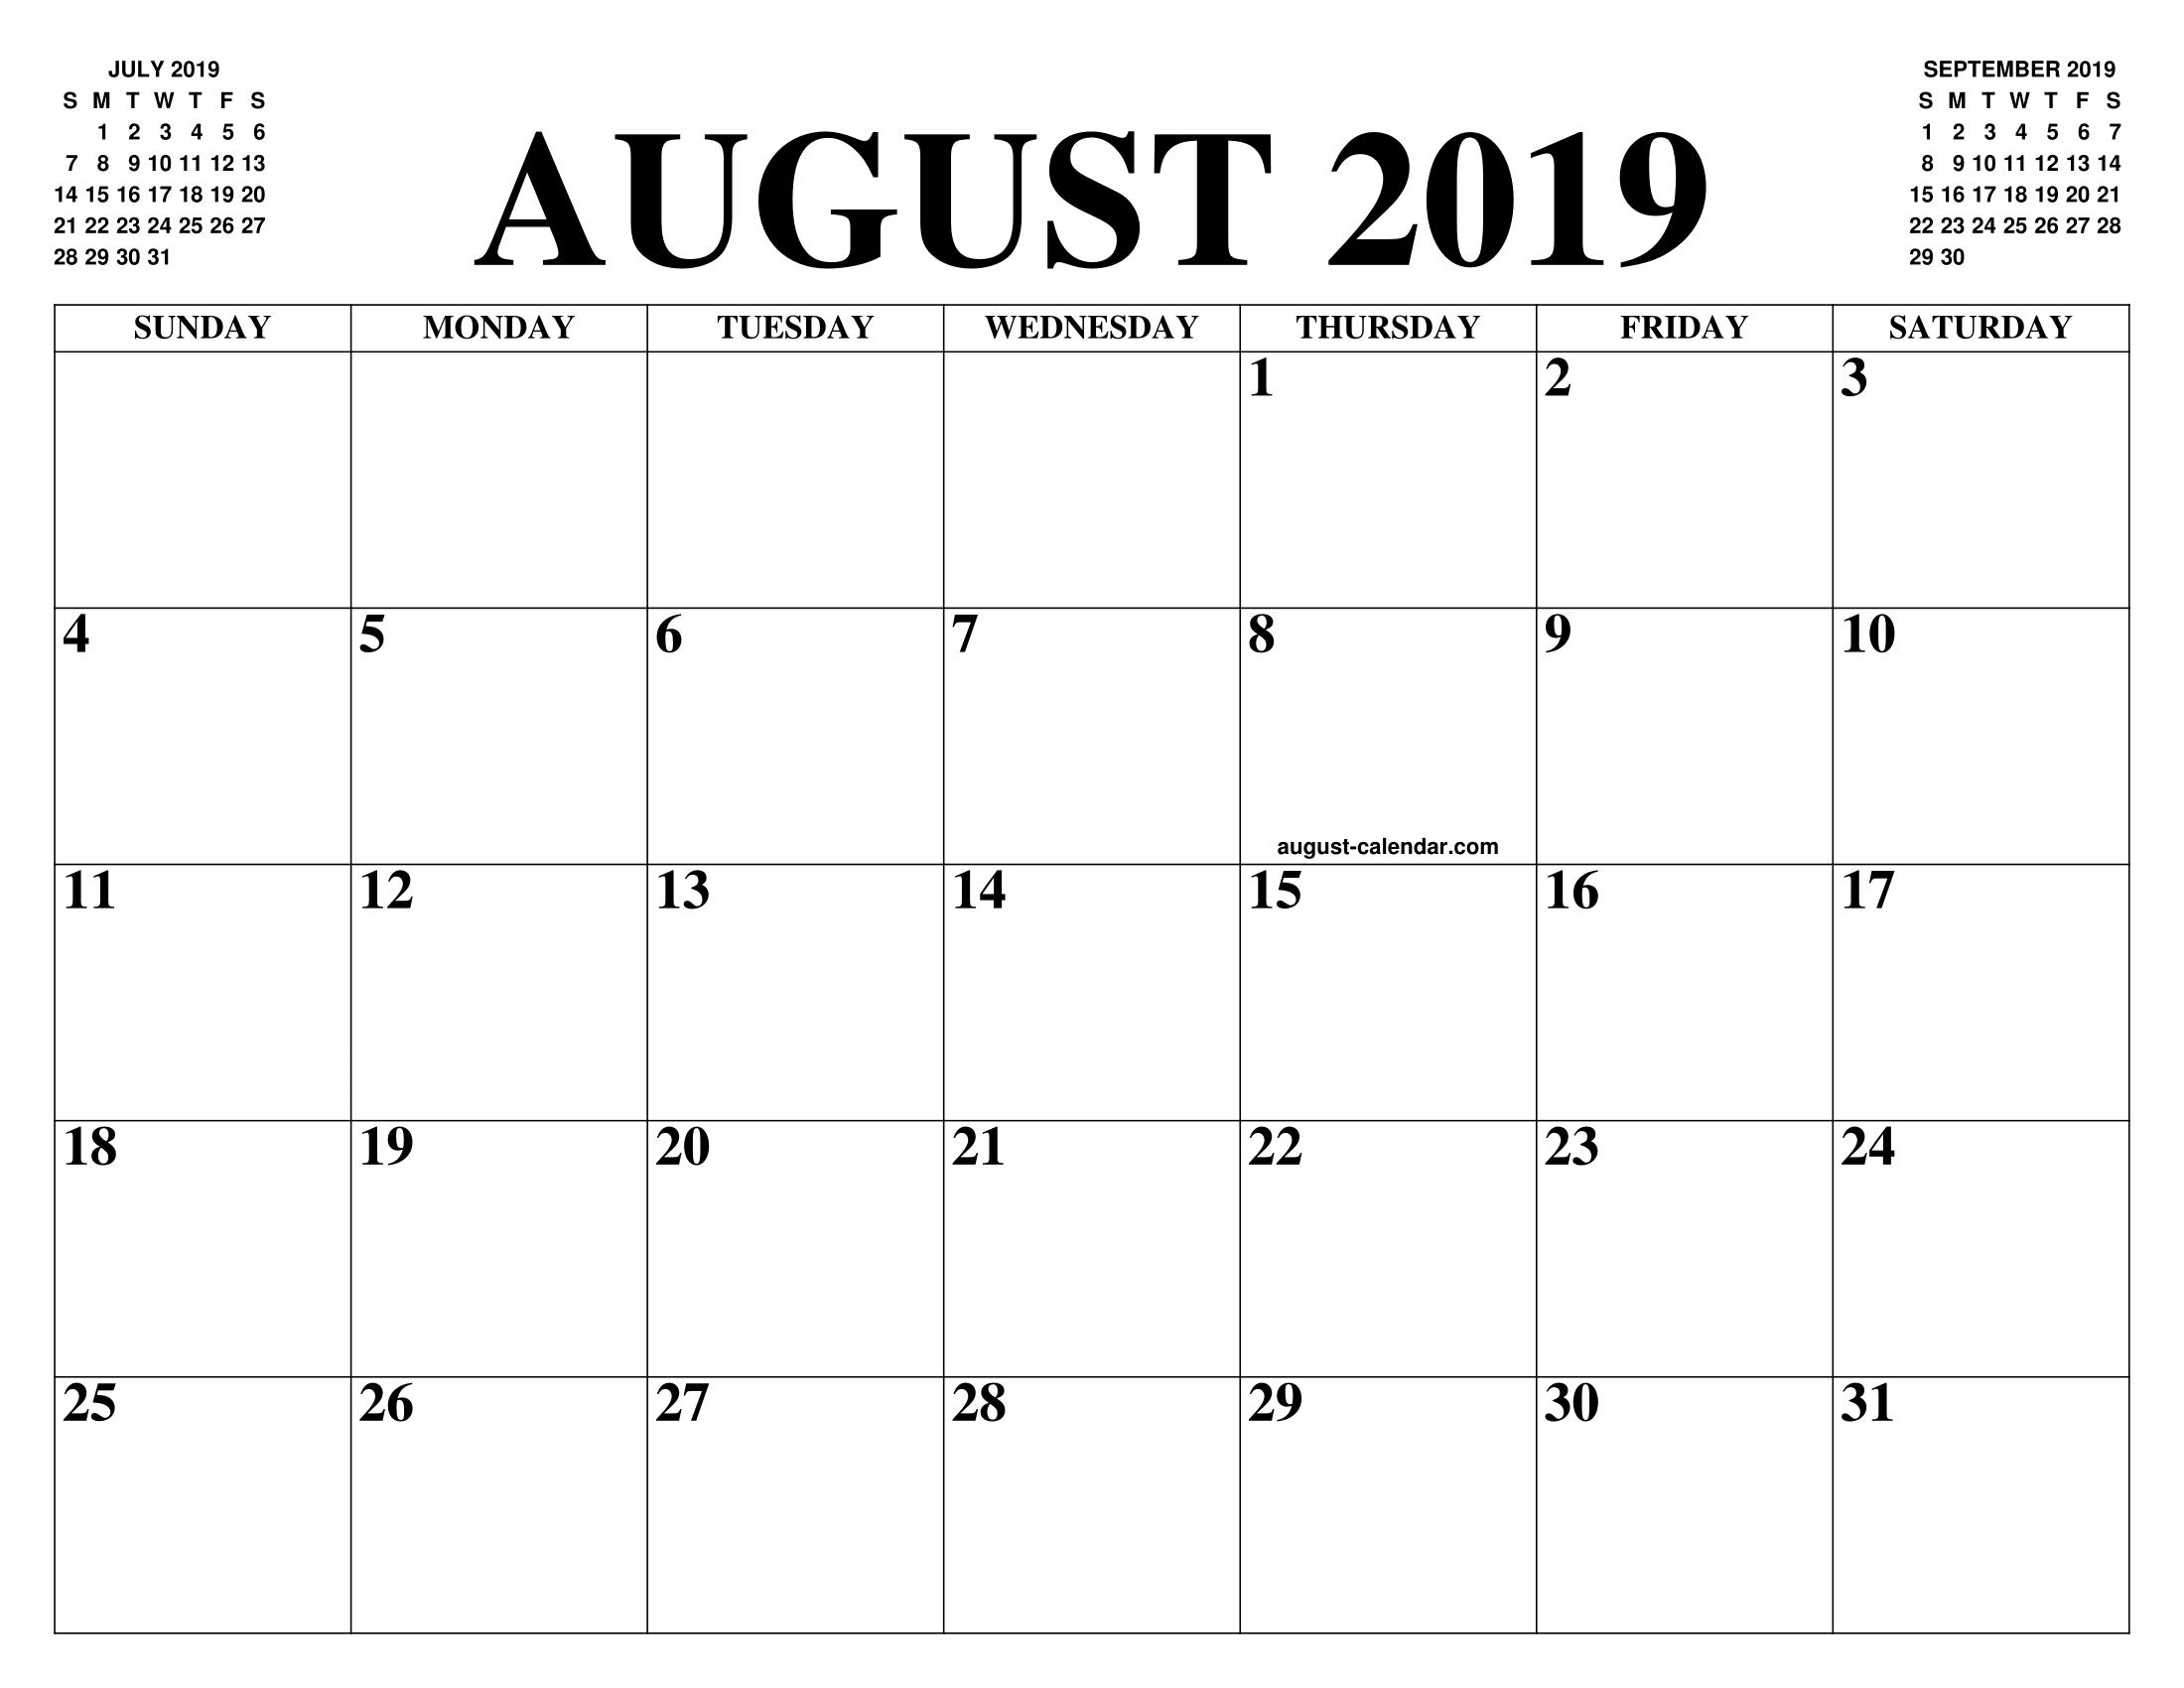 August Calendar 2019 : August calendar of the month free printable